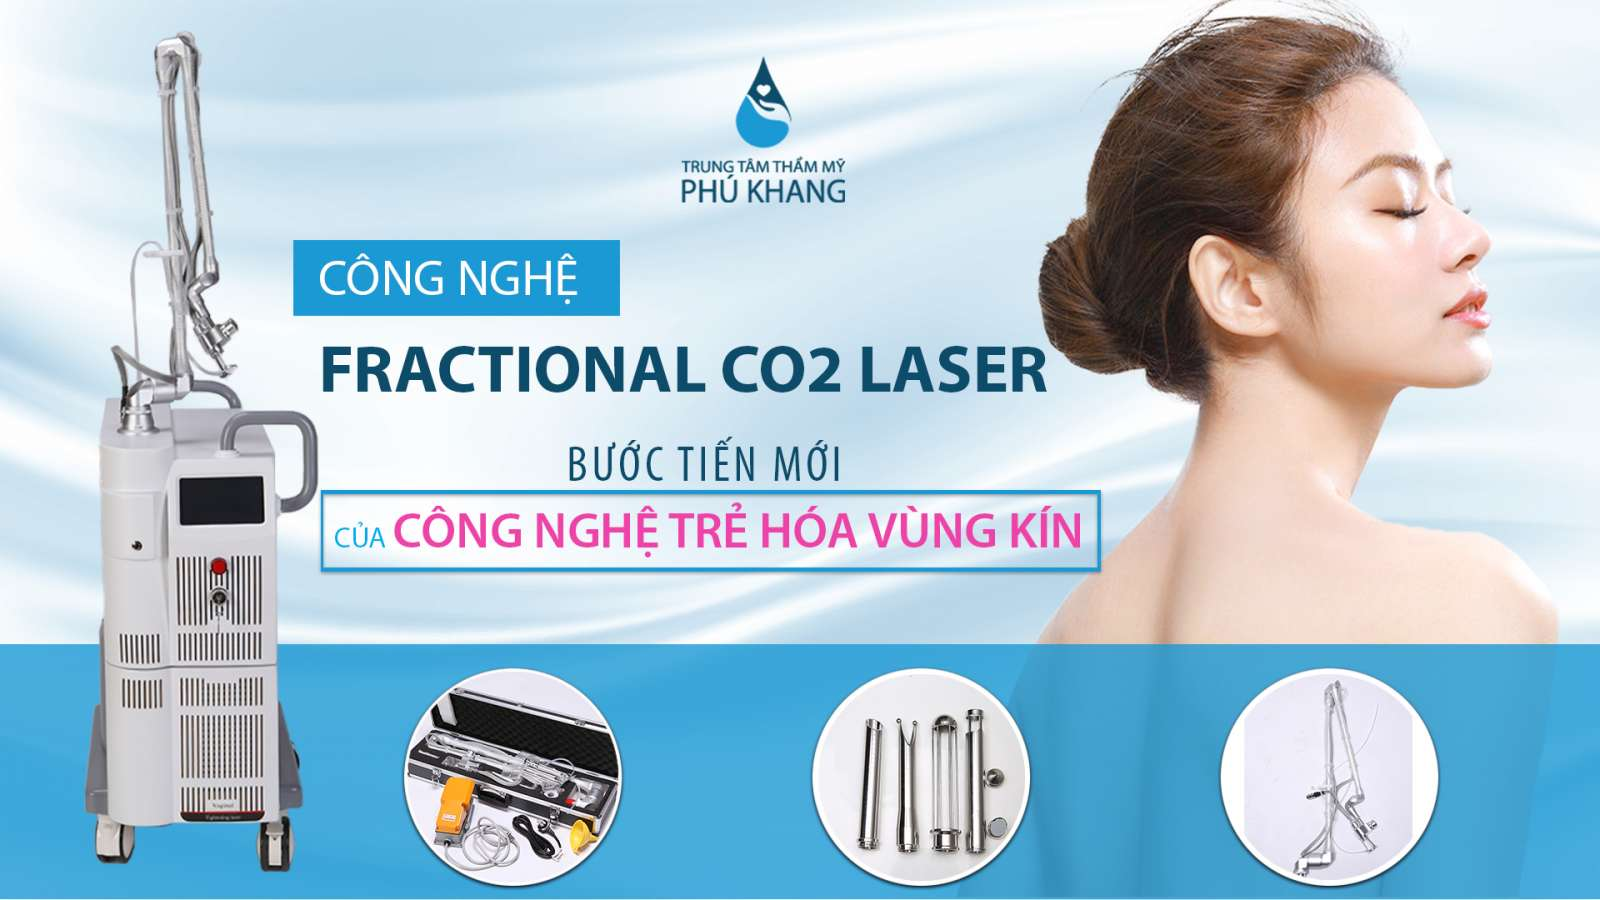 ap-dung-cong-nghe-phun-hong-vung-kin-bang-laser-fractional-co2